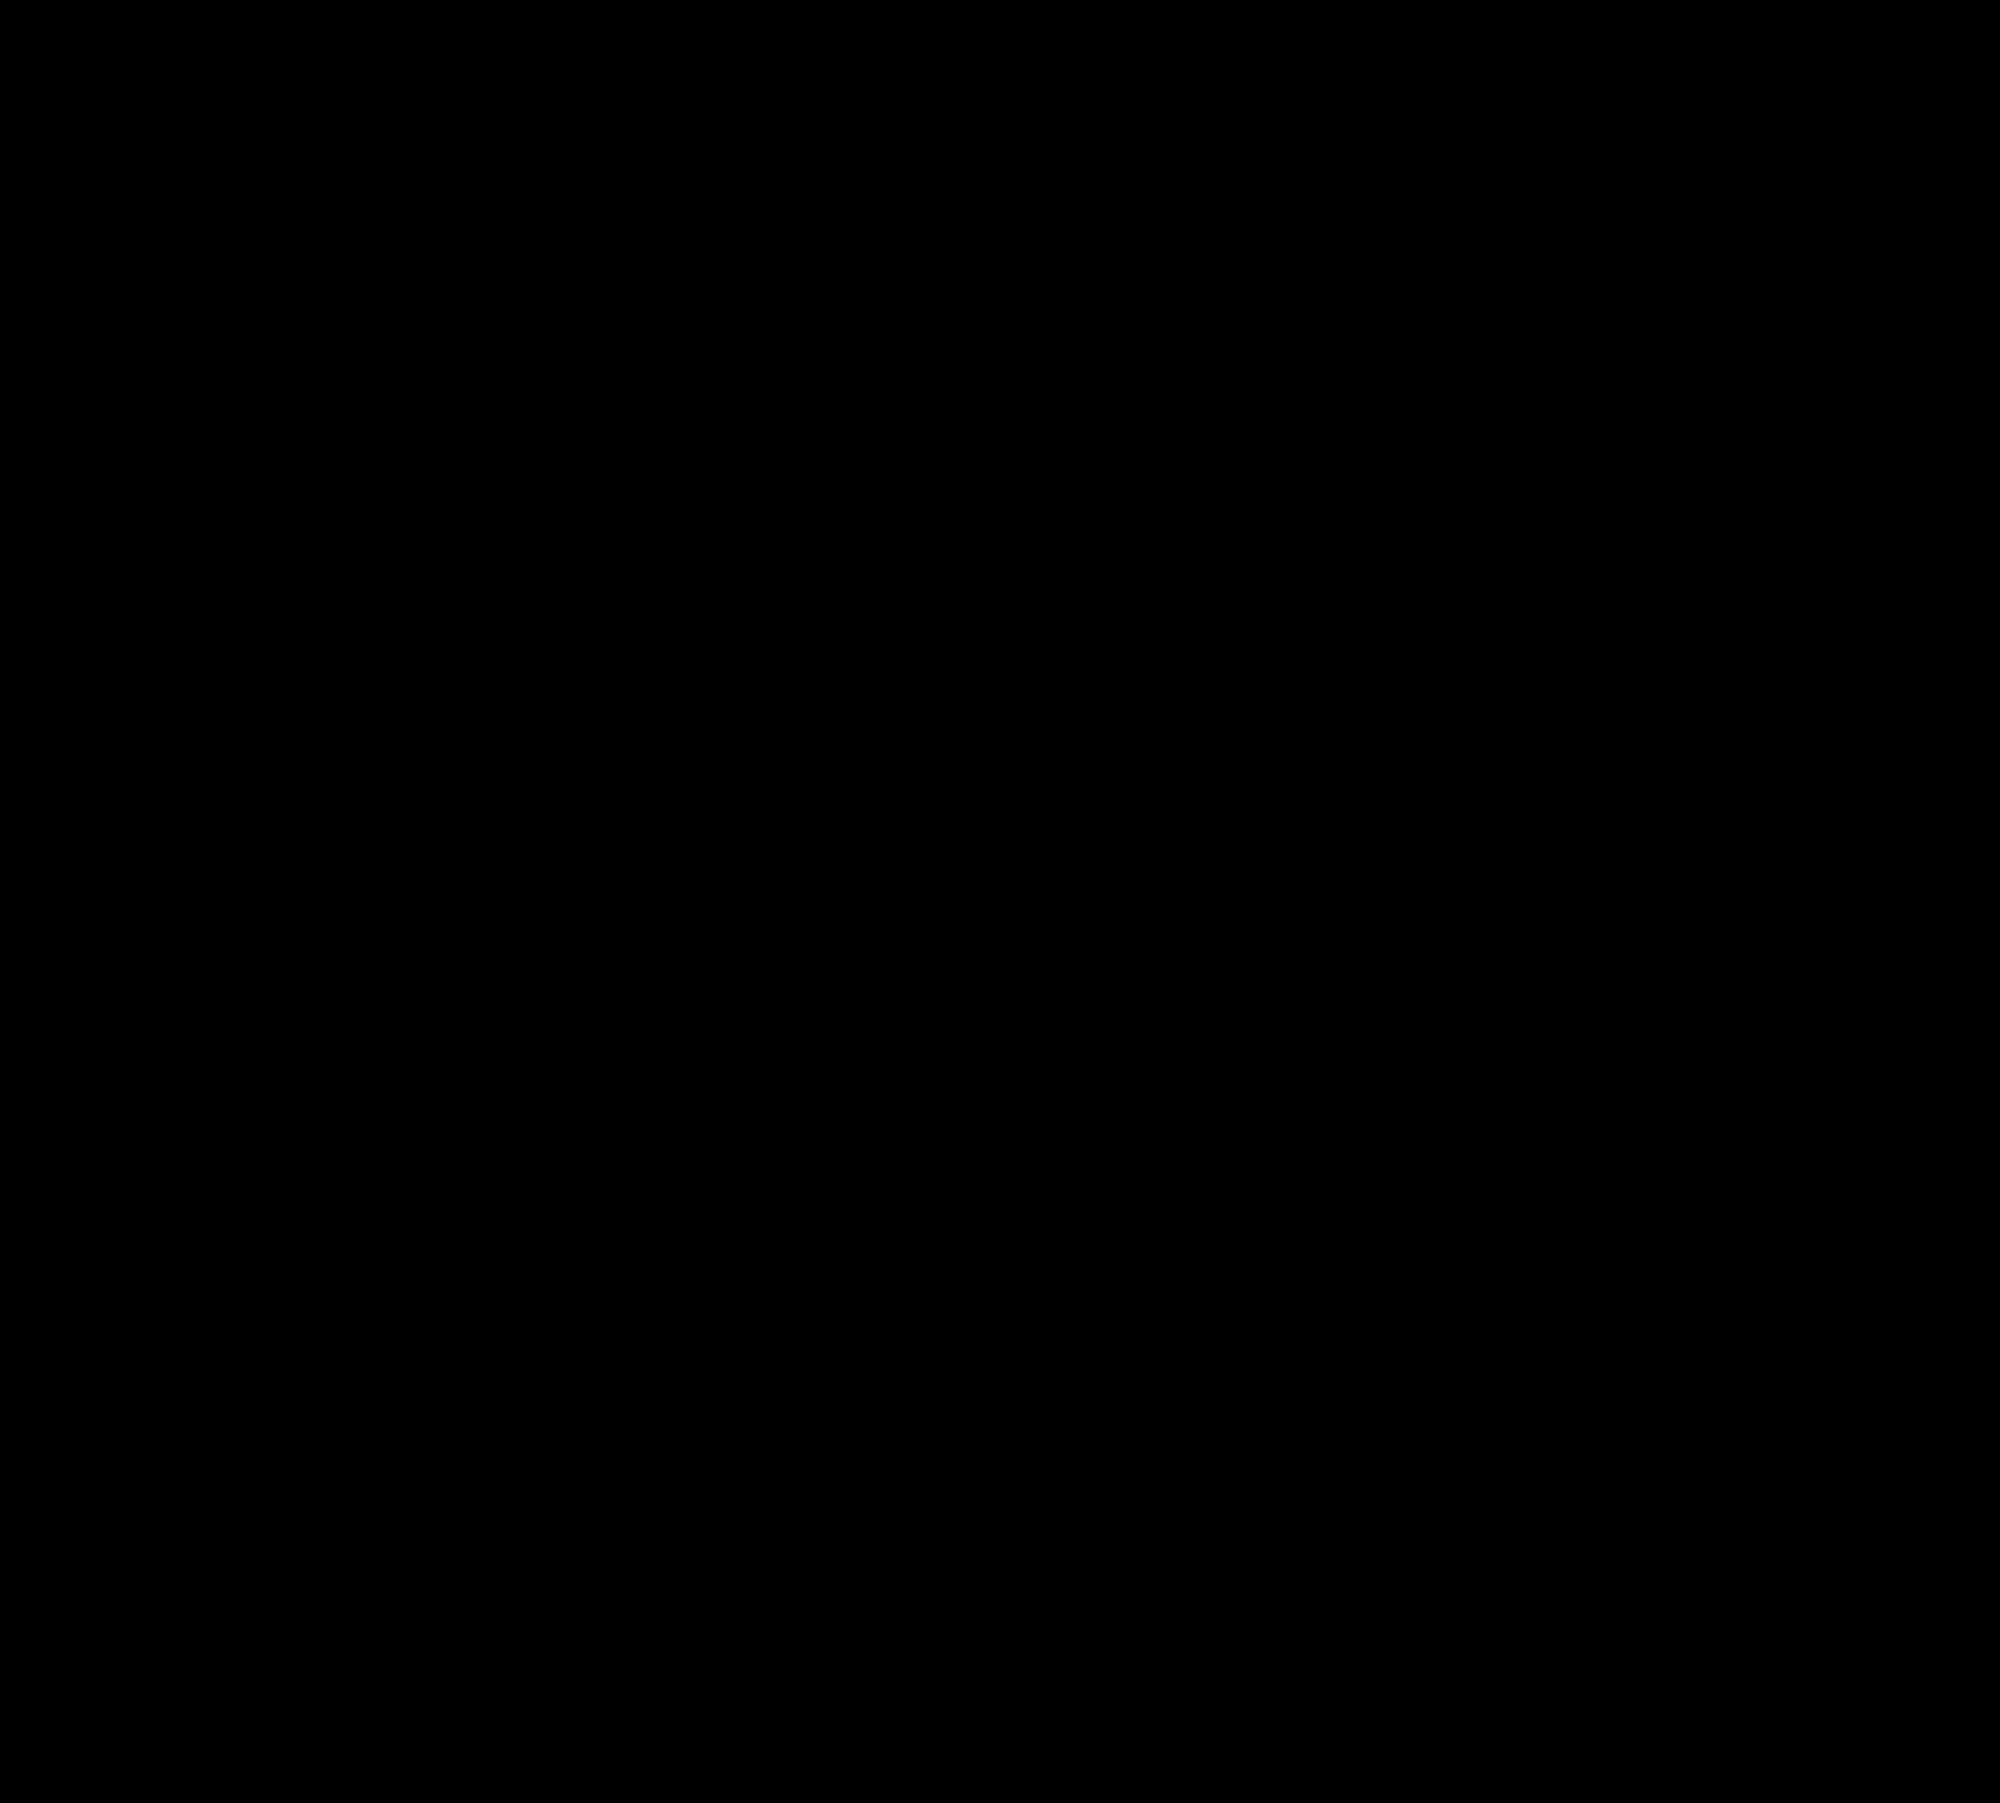 worksheet Obtuse Isosceles Benaffleckweb Worksheets for – Isosceles Triangles Worksheet